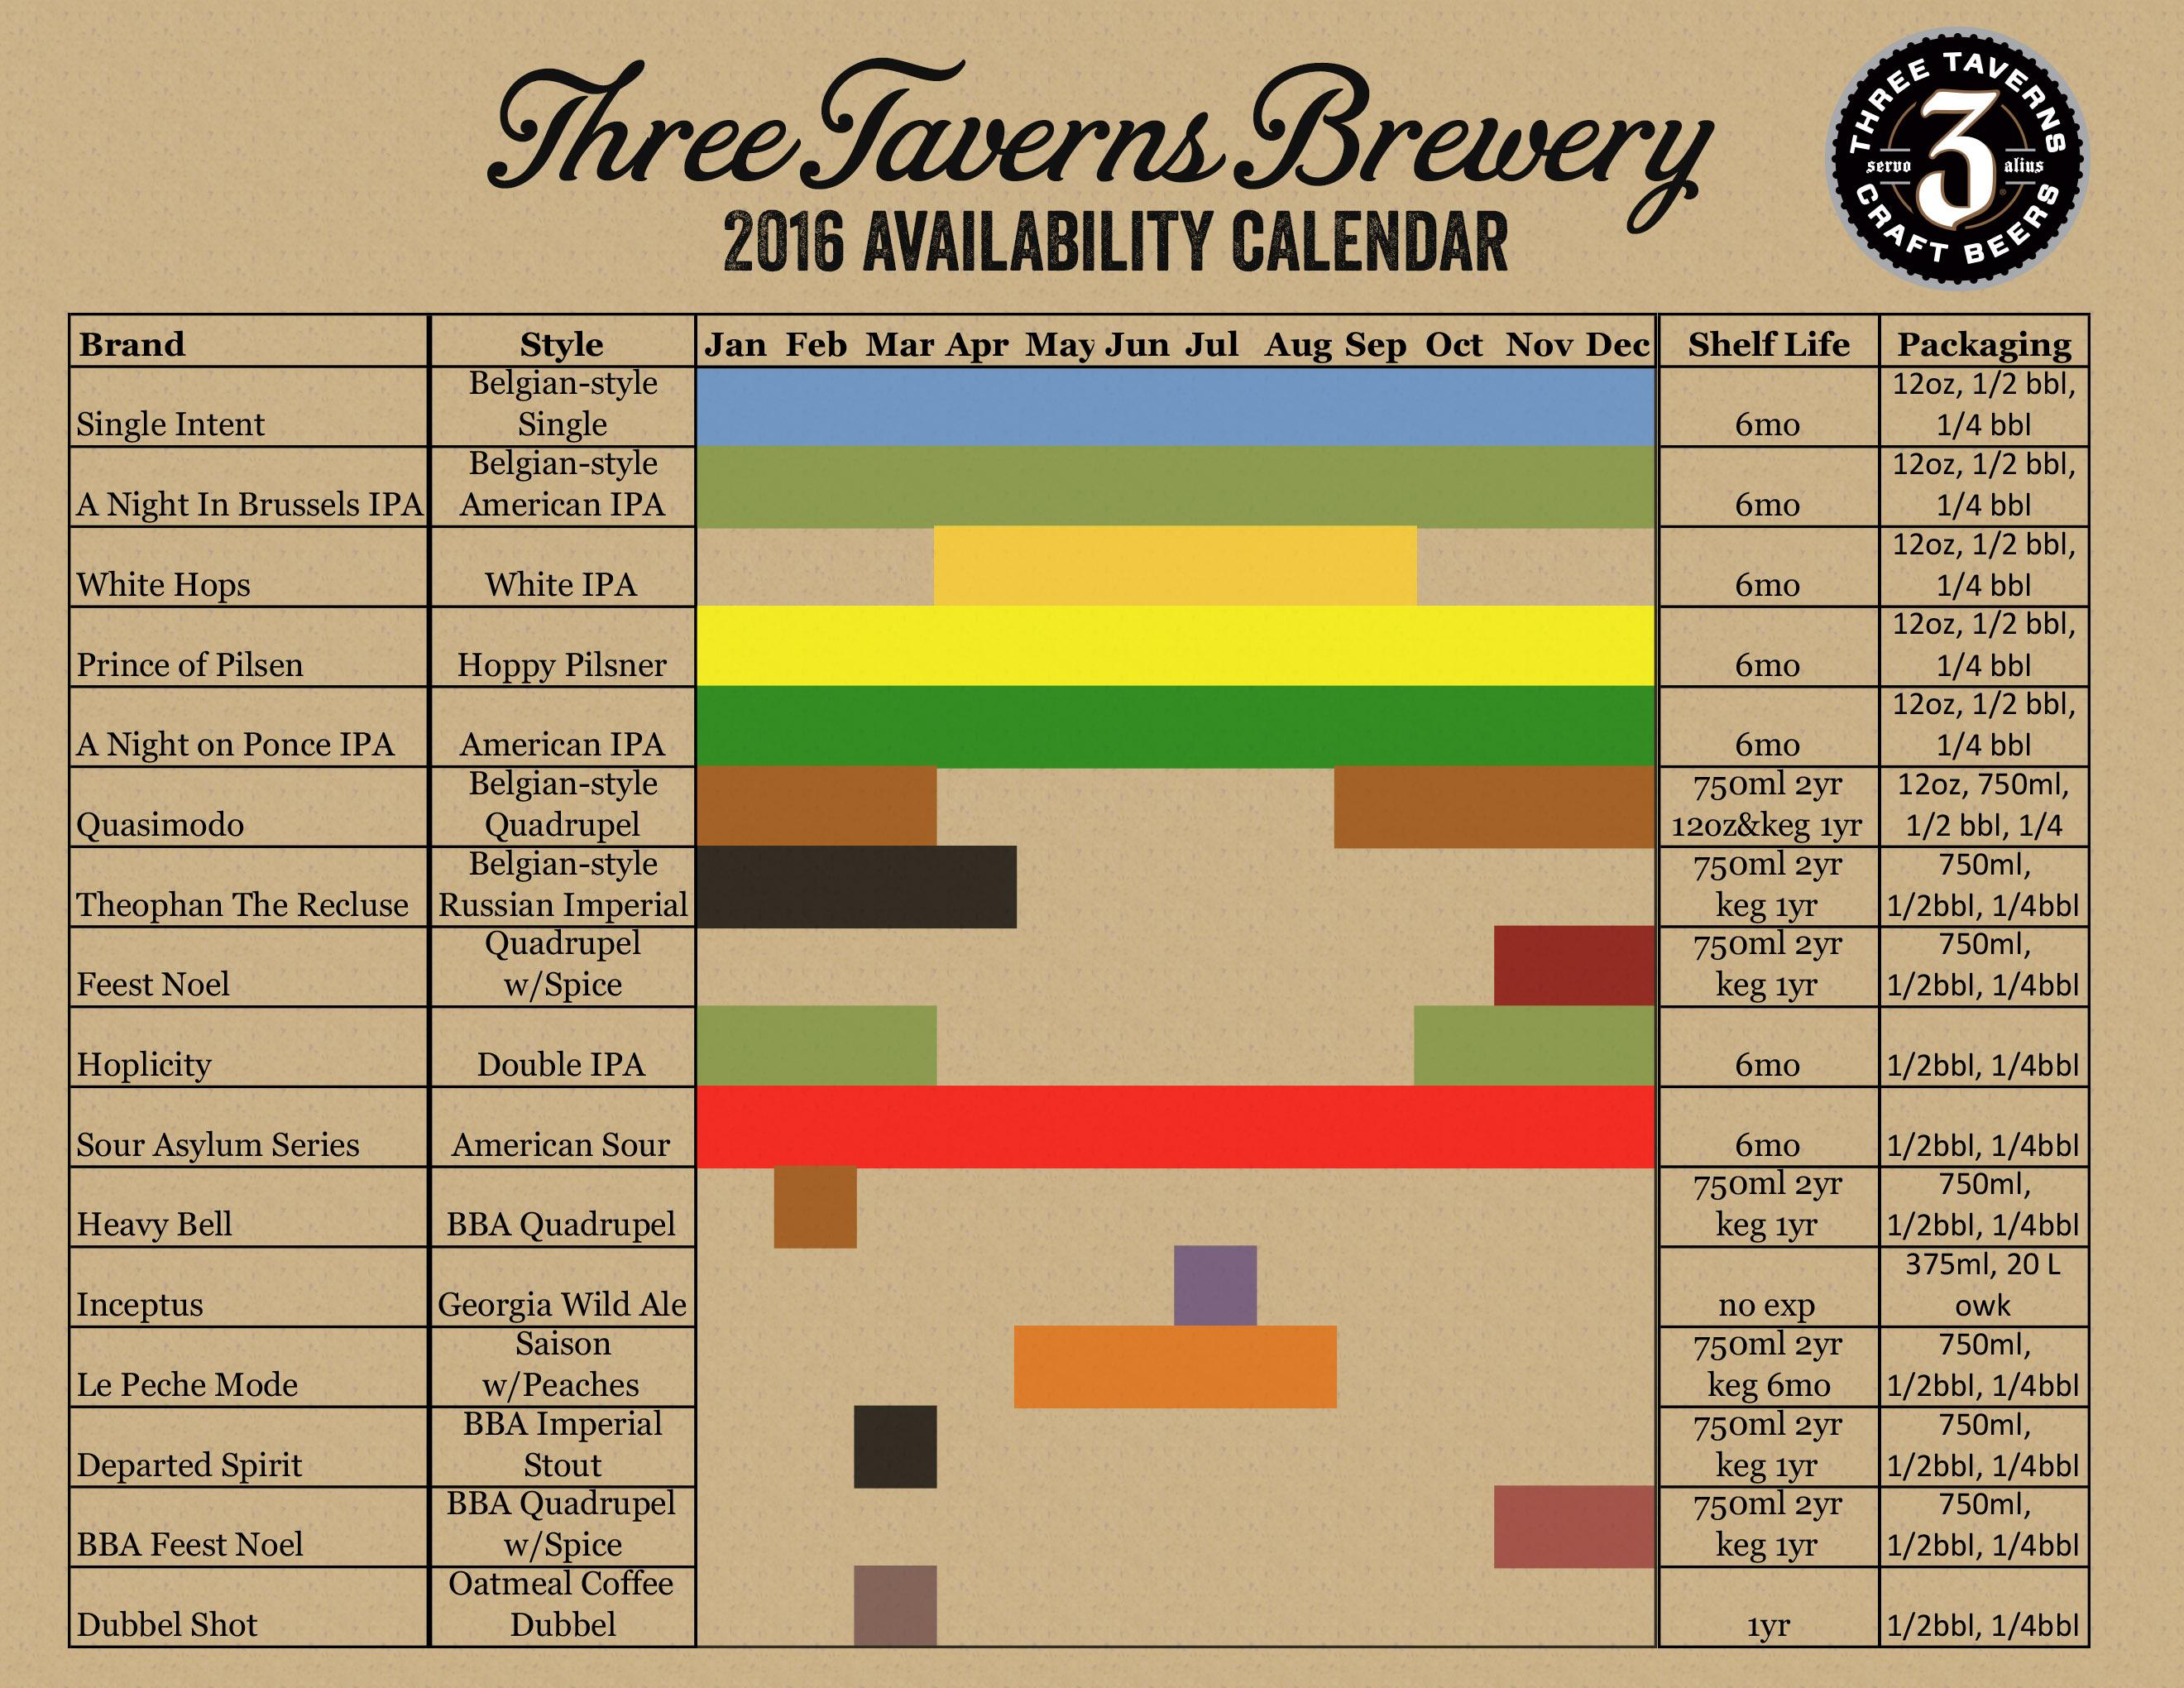 2016 Three Taverns Brewery Release Calendar